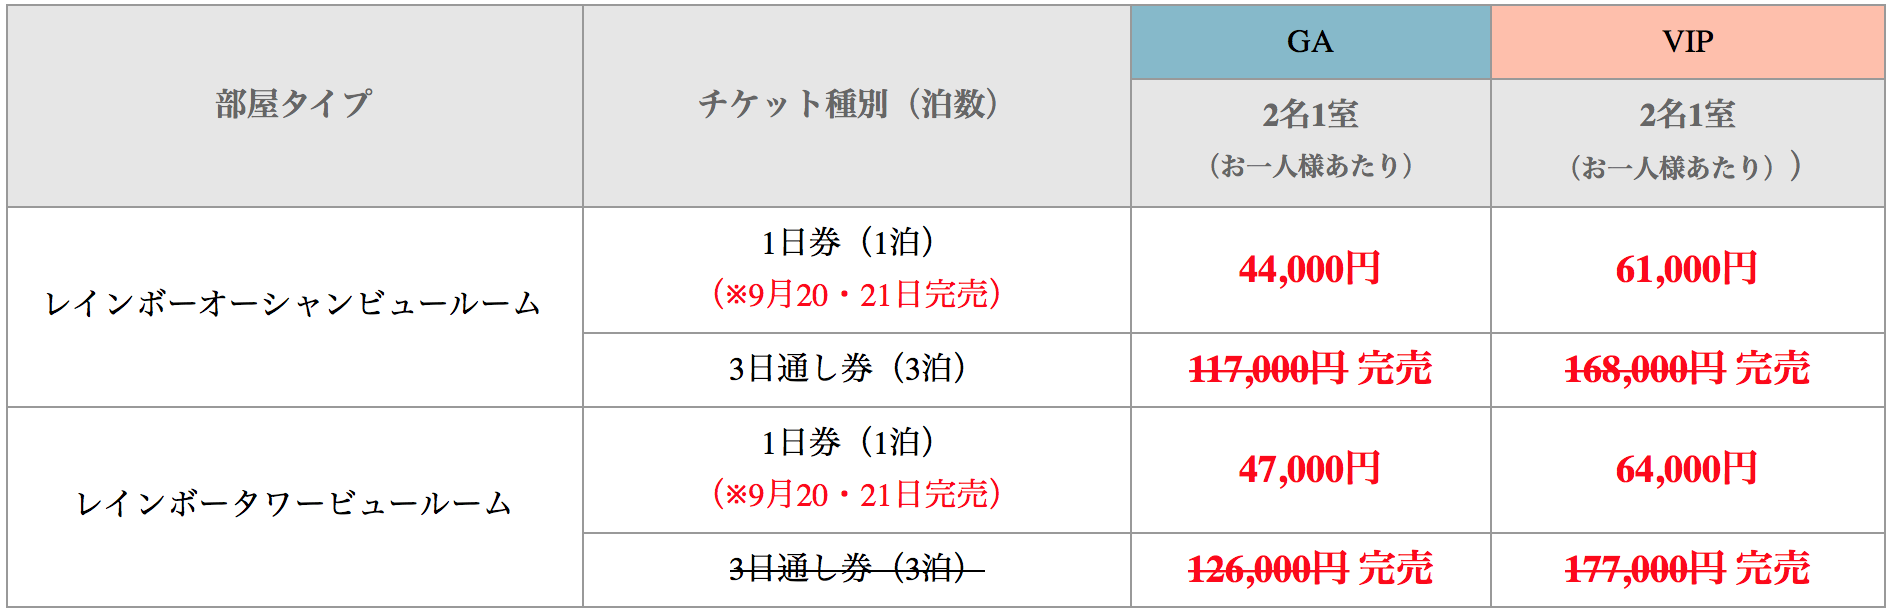 (出典:ULTRA JAPAN)